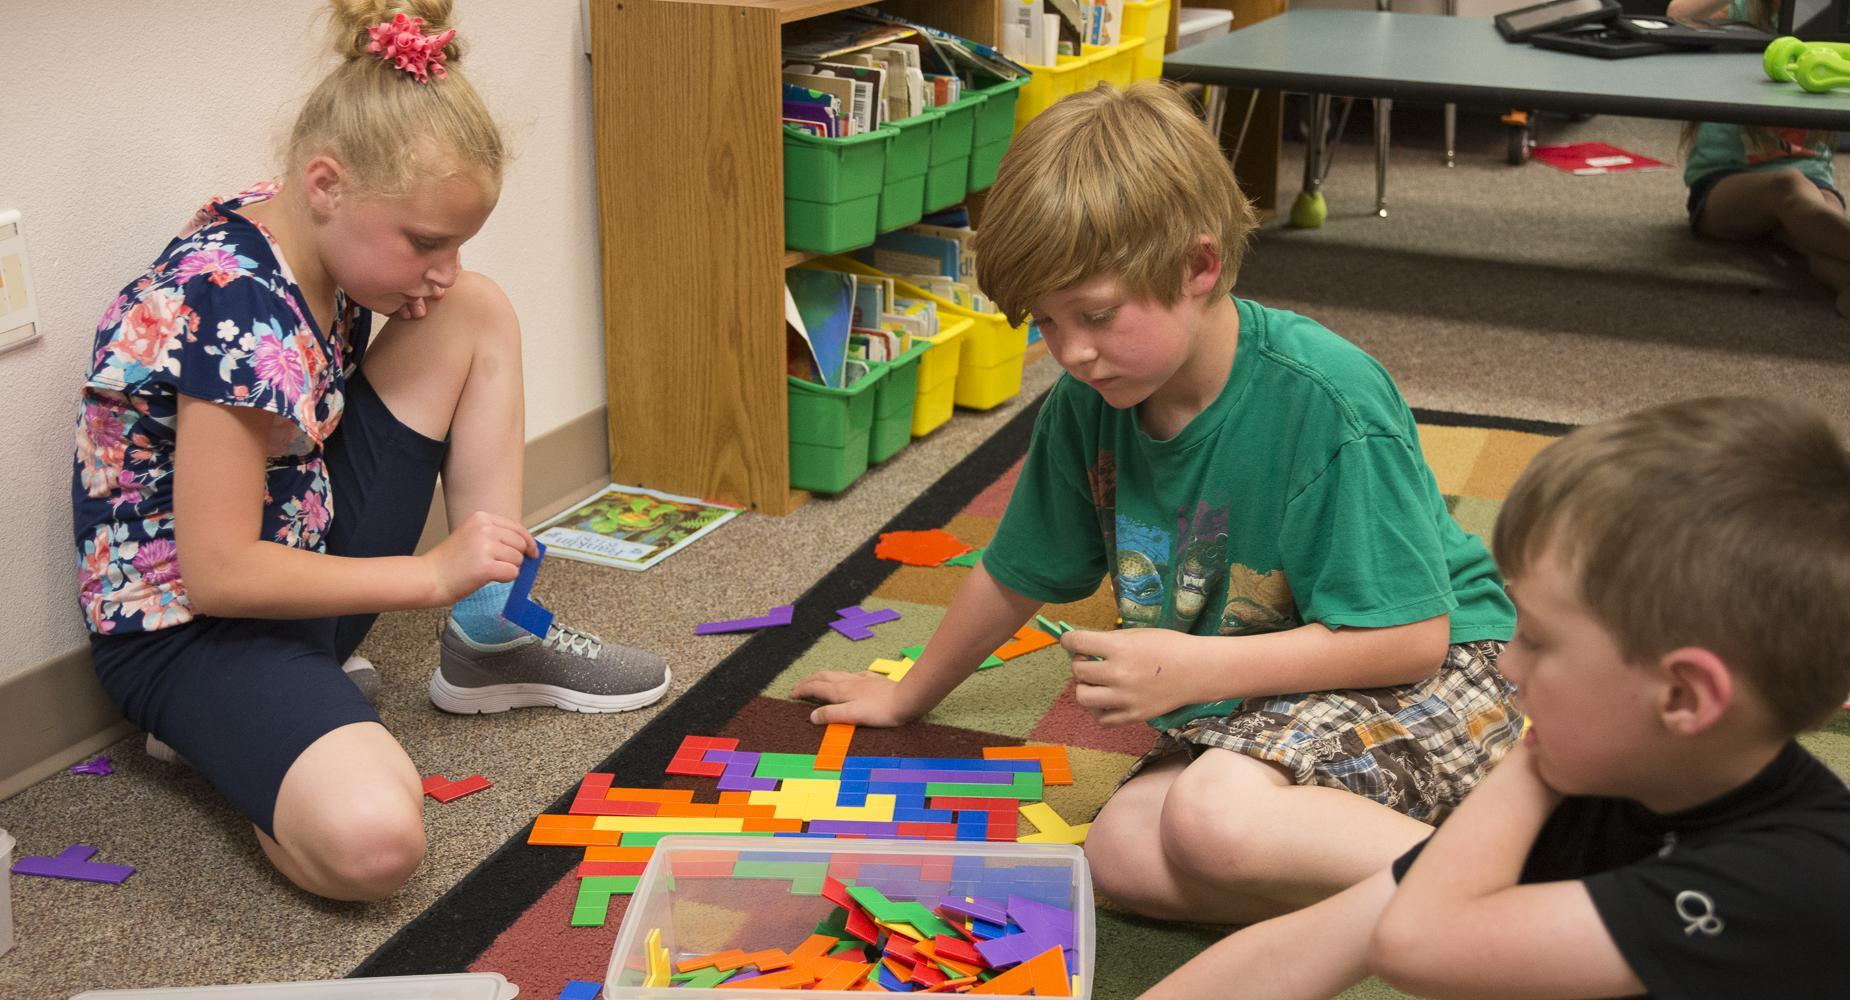 Children arrange geometric shapes on the carpet